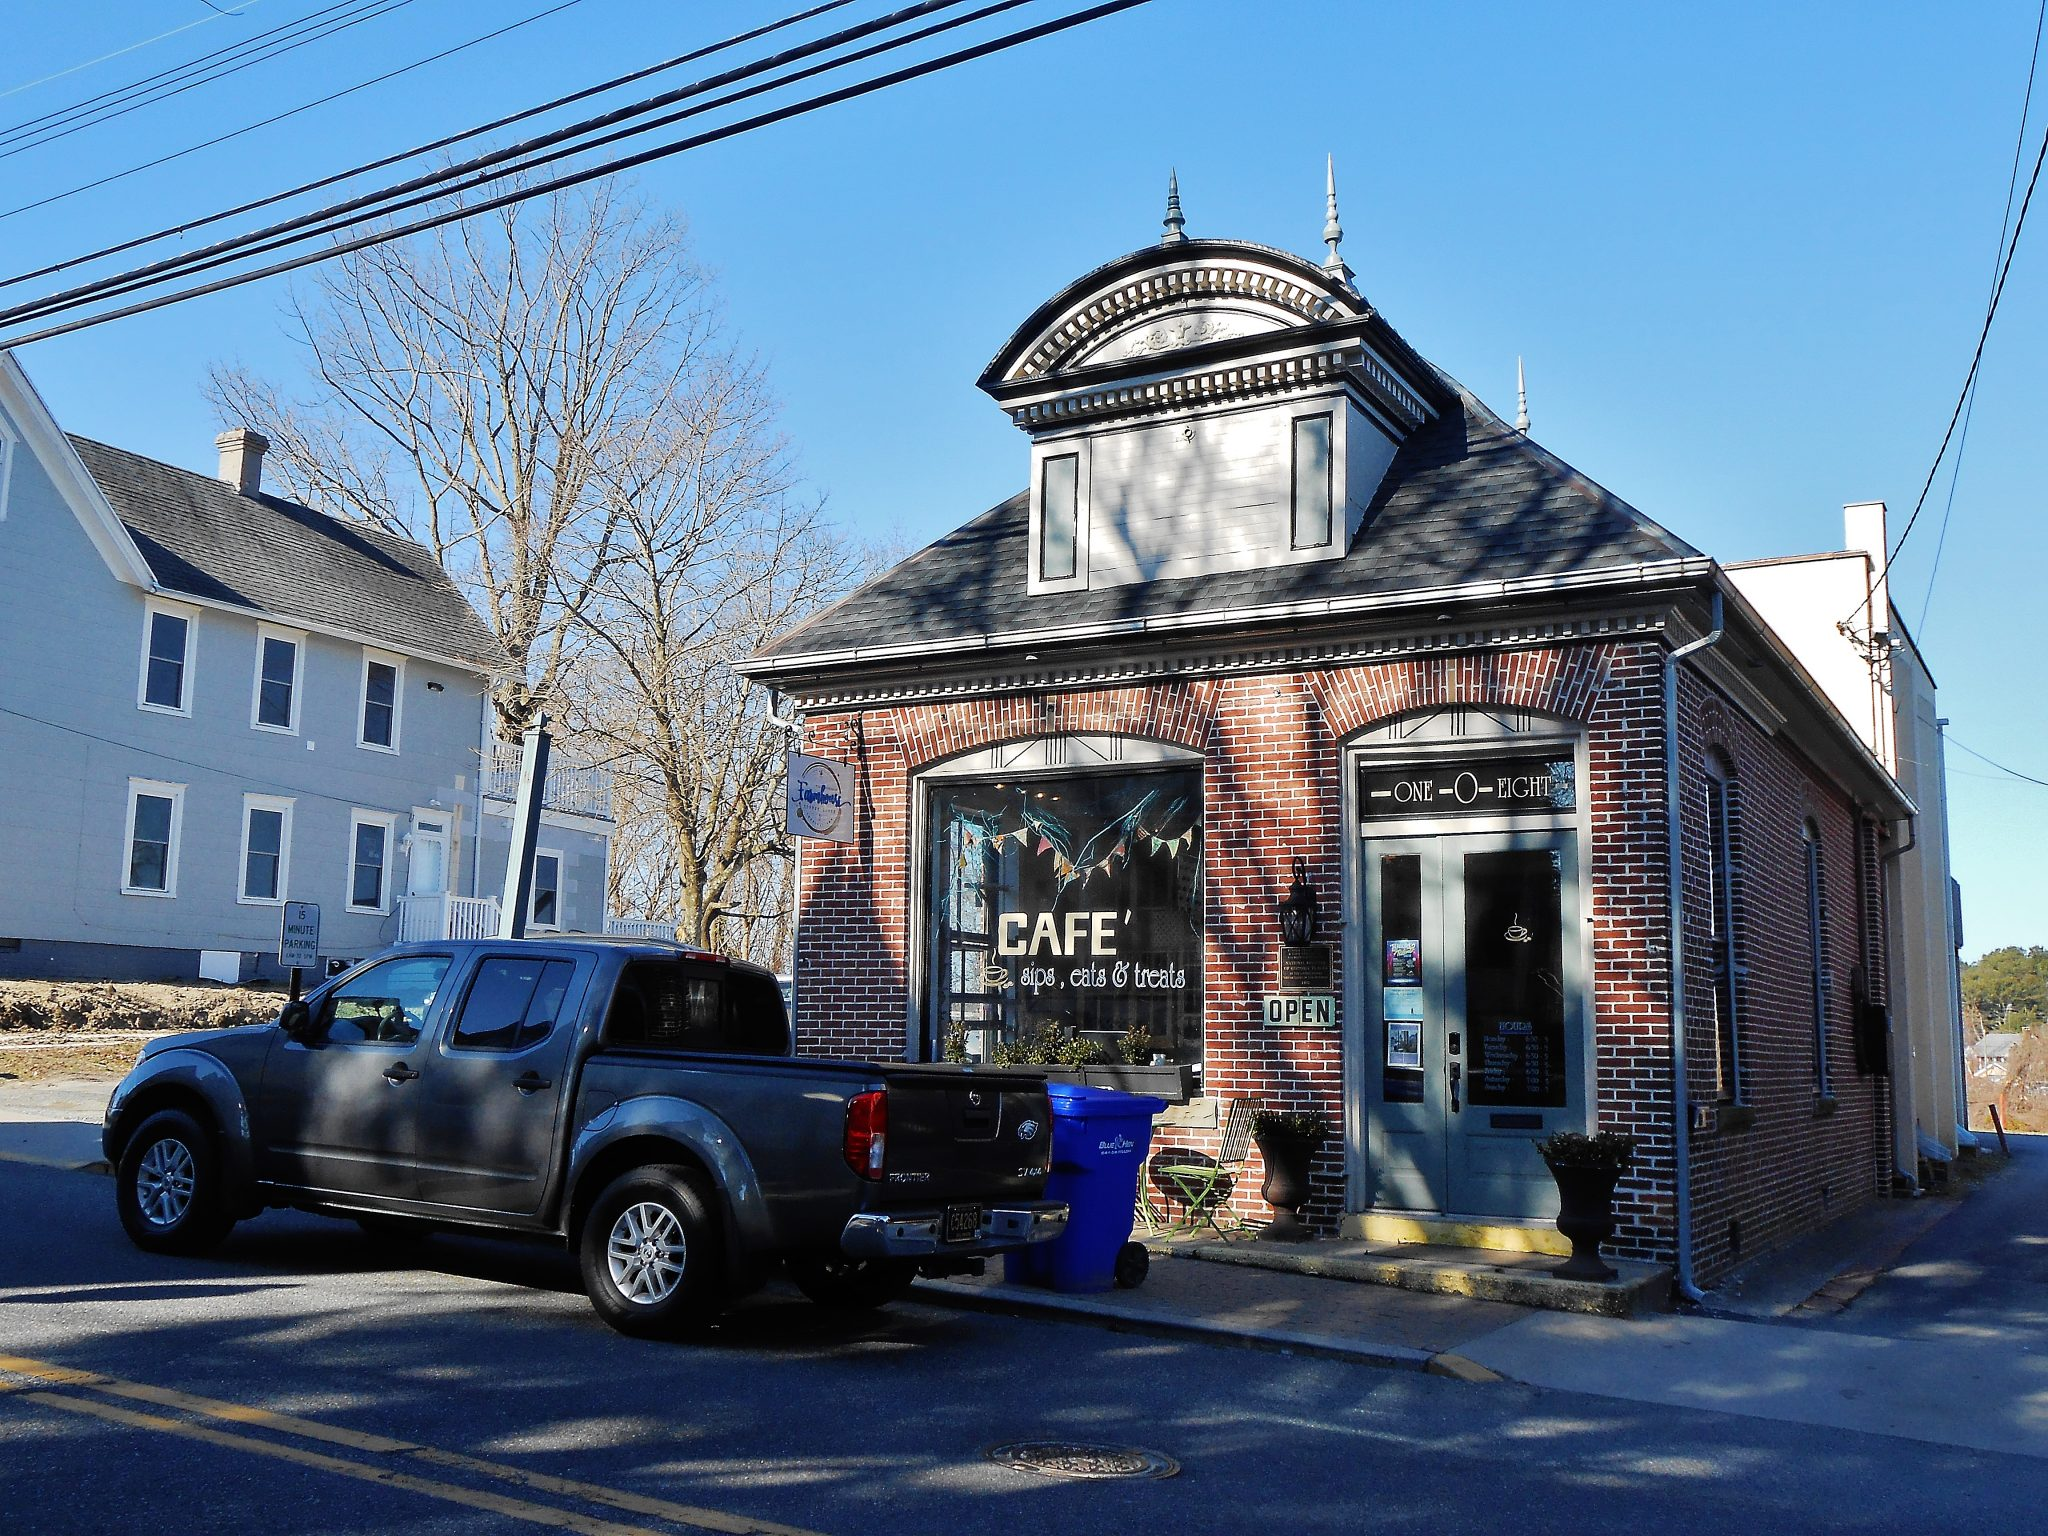 Internet café in Milton, Delaware